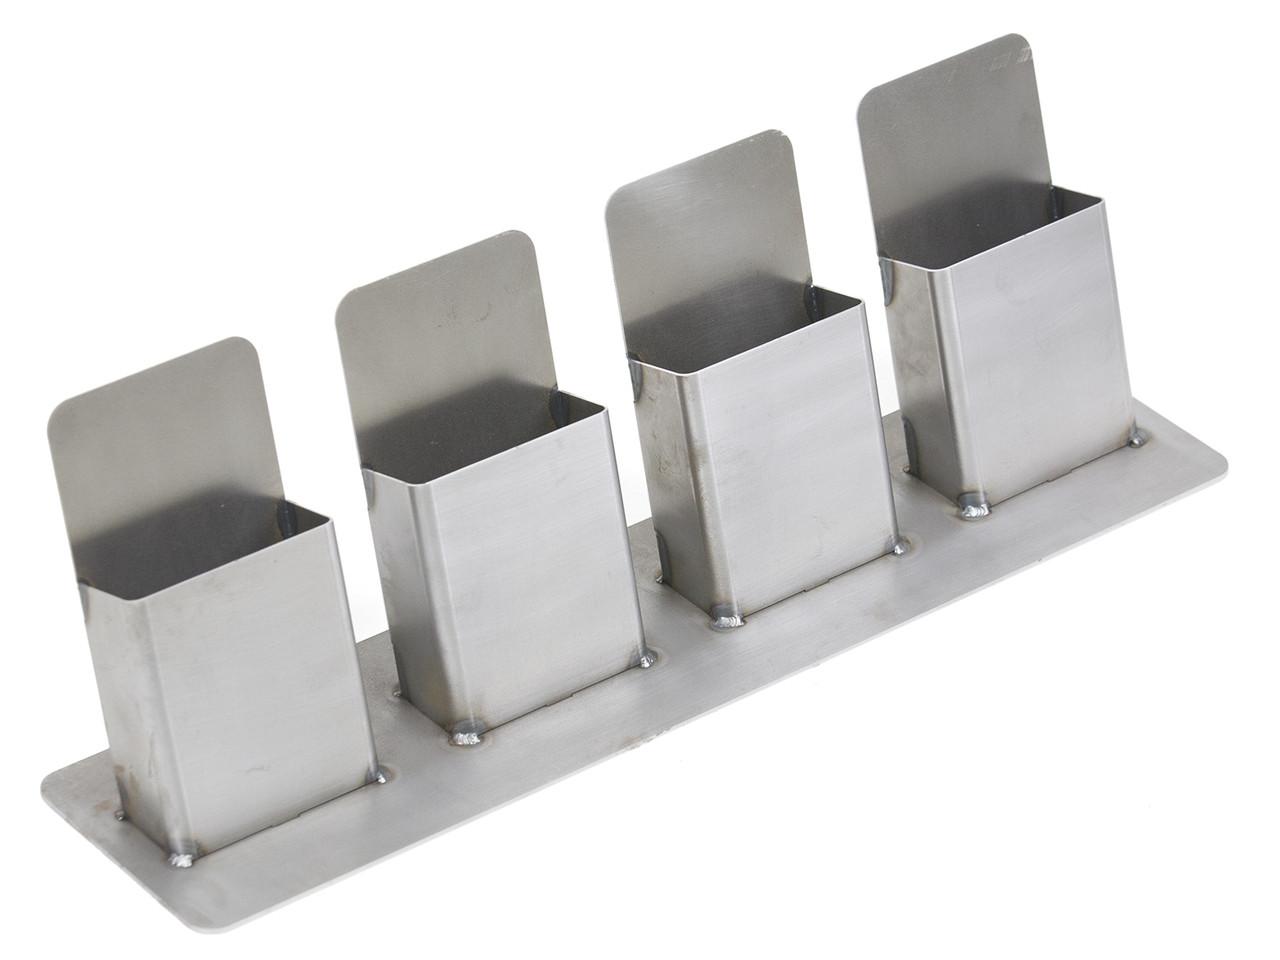 GenRight Steel Trifold Holder